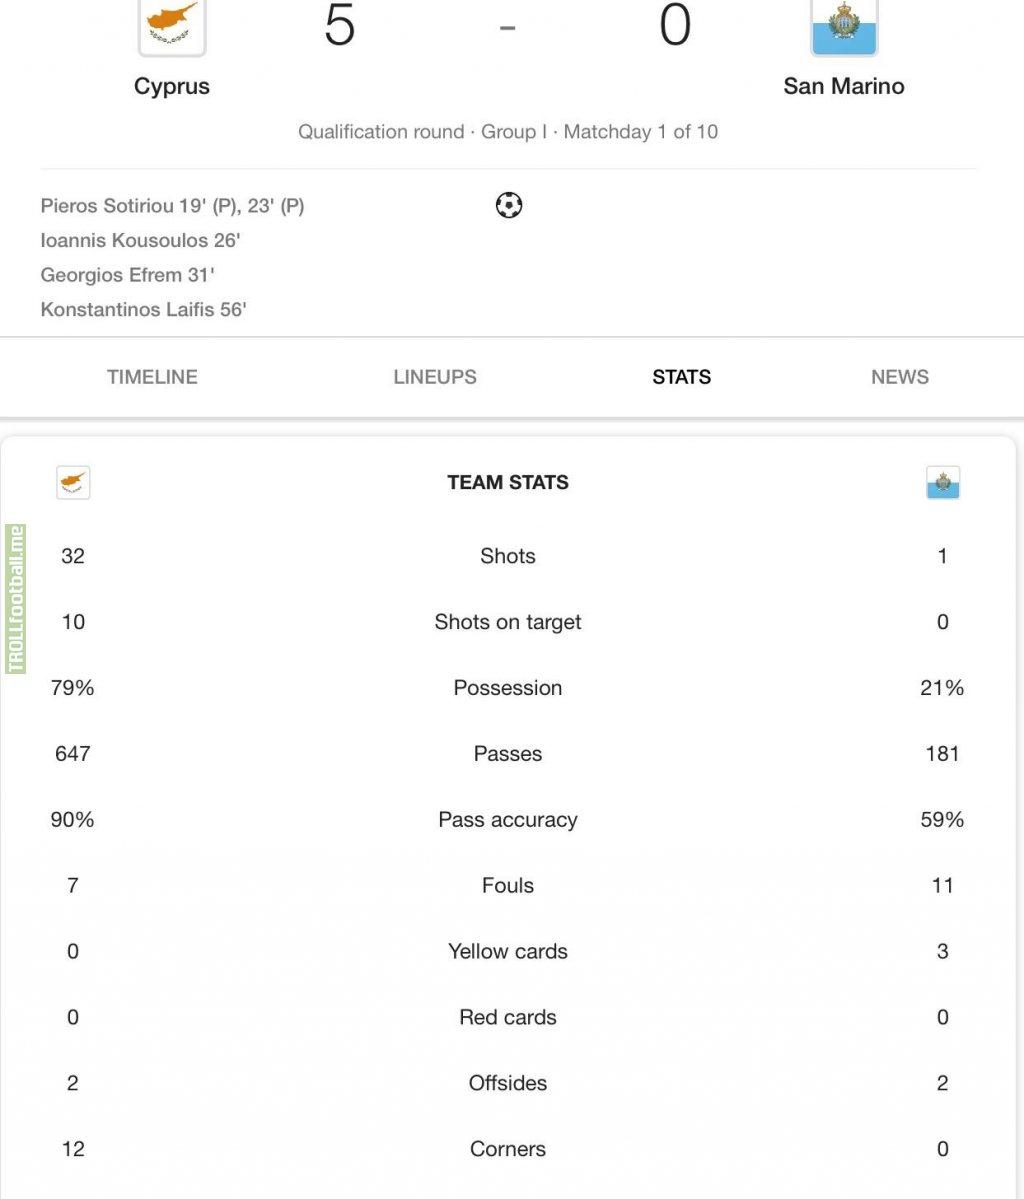 Cyprus vs San Marino in statistics